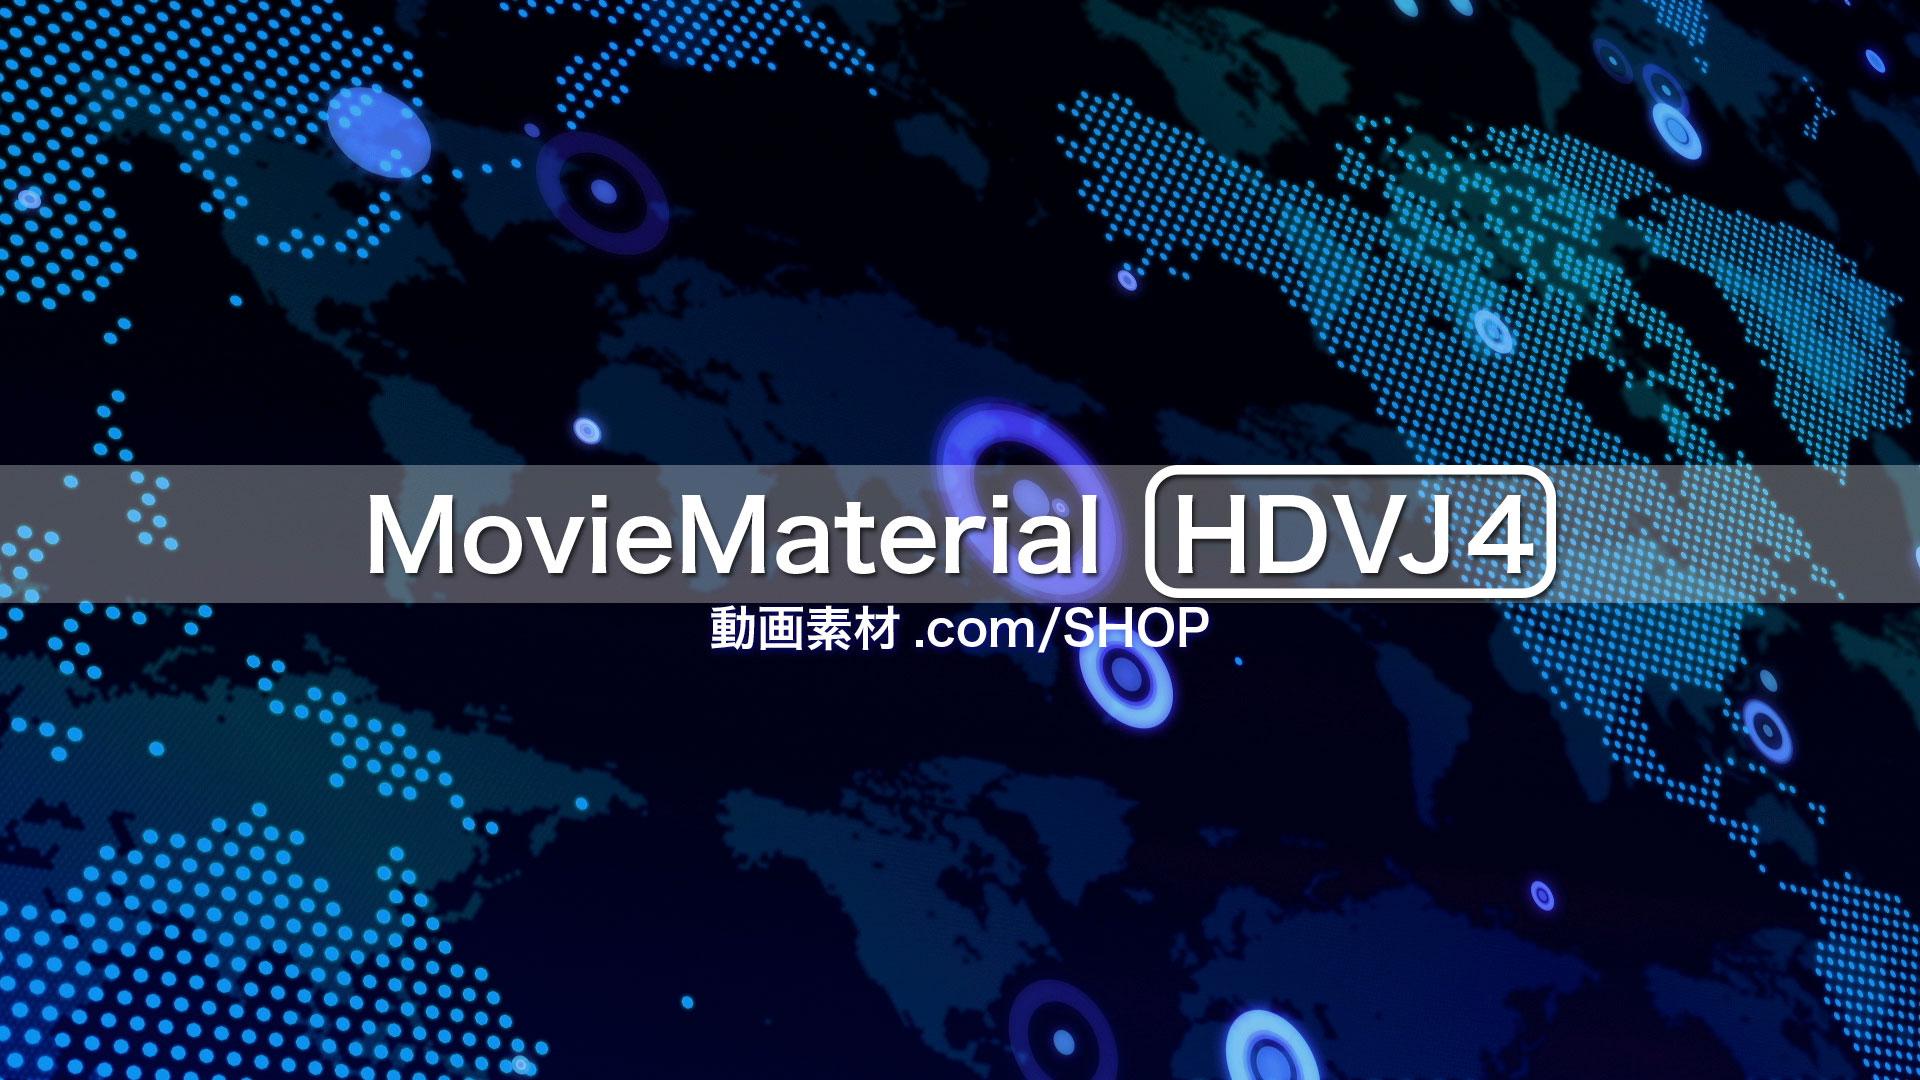 MovieMaterial HDVJ4 フルハイビジョンVJ動画素材集 画像3